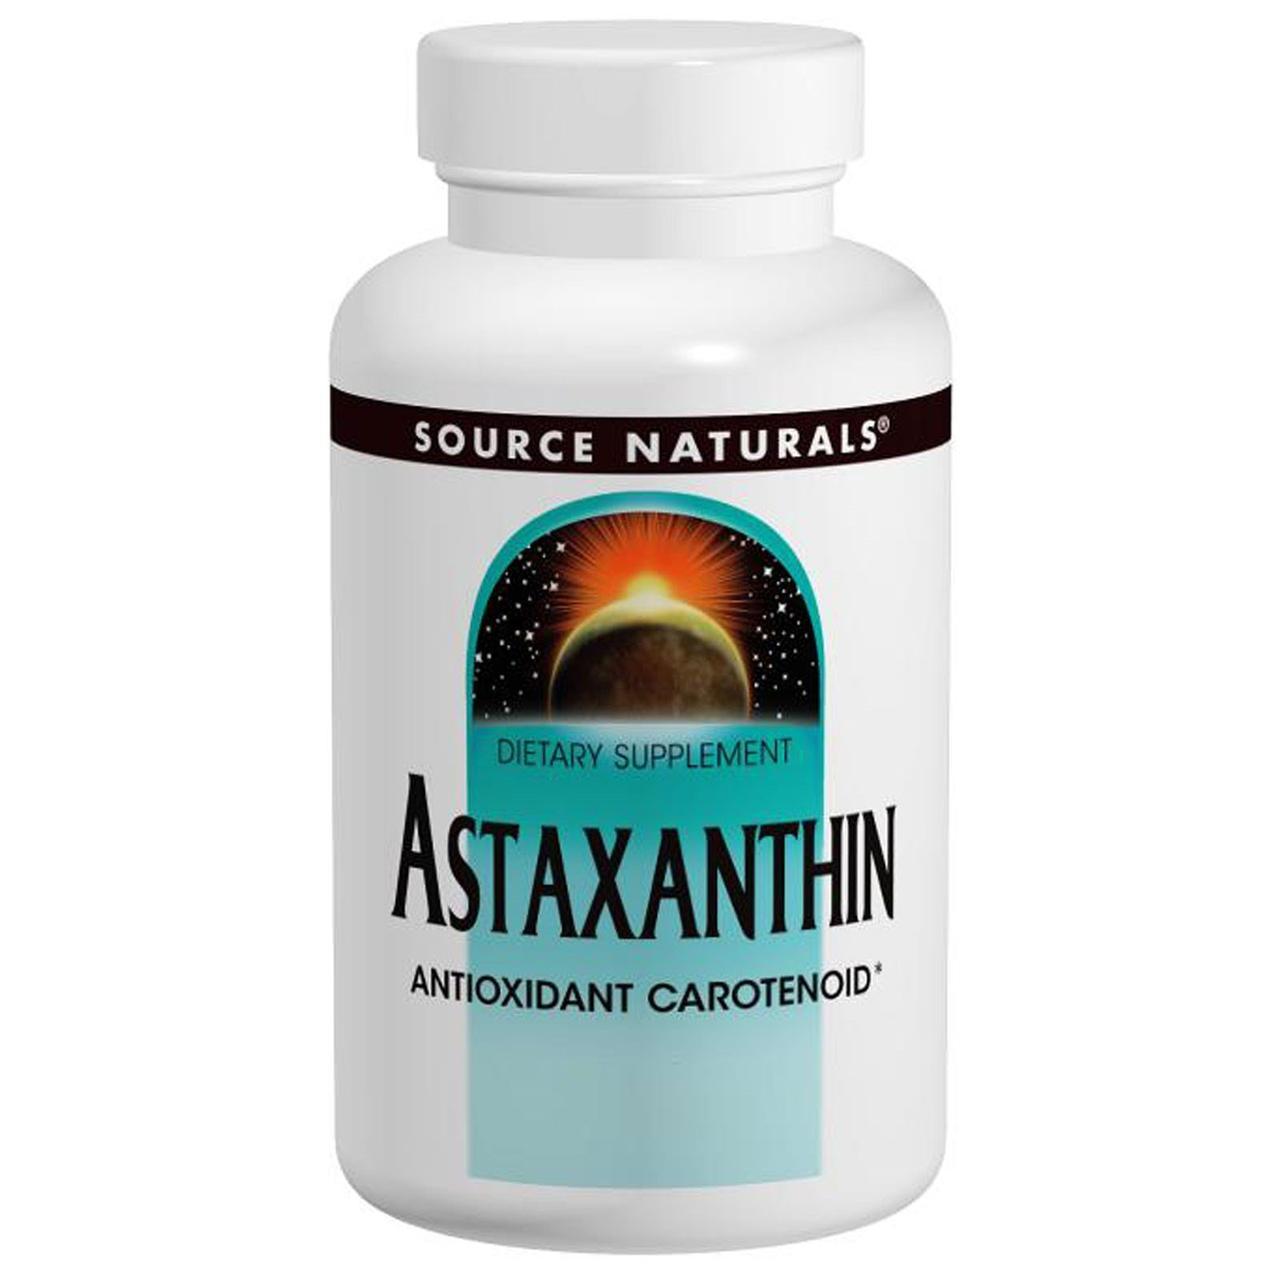 Астаксантин, Astaxanthin, Source Naturals, 2 мг, 120 капсул